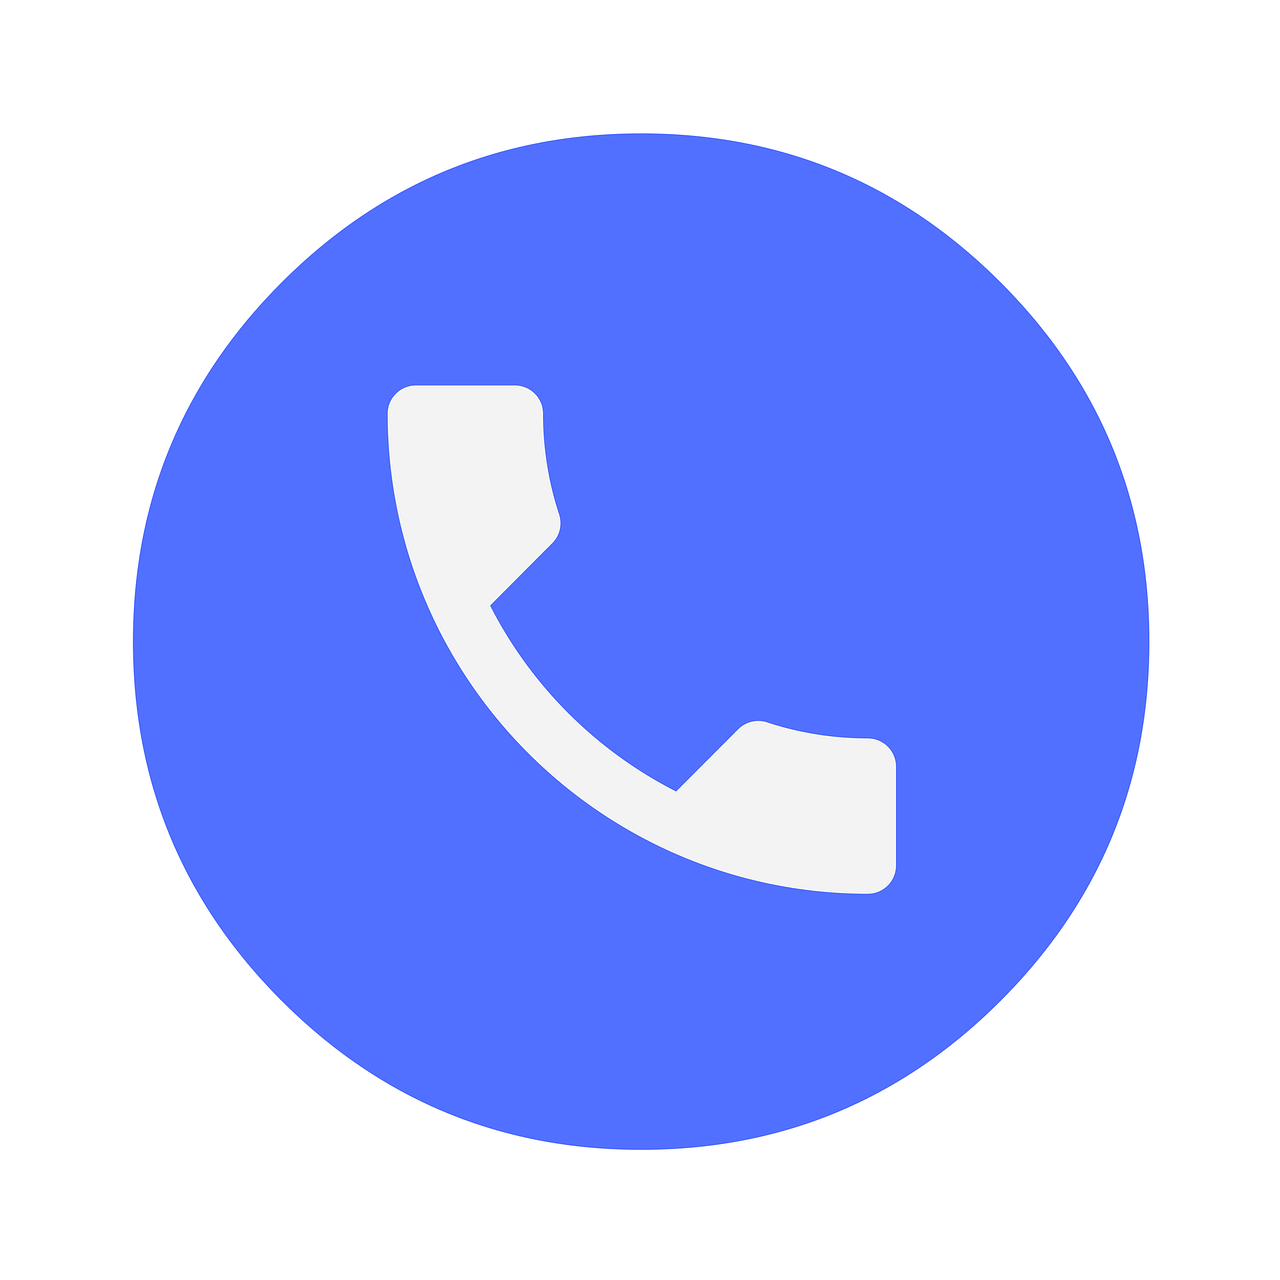 icon, phone, speak